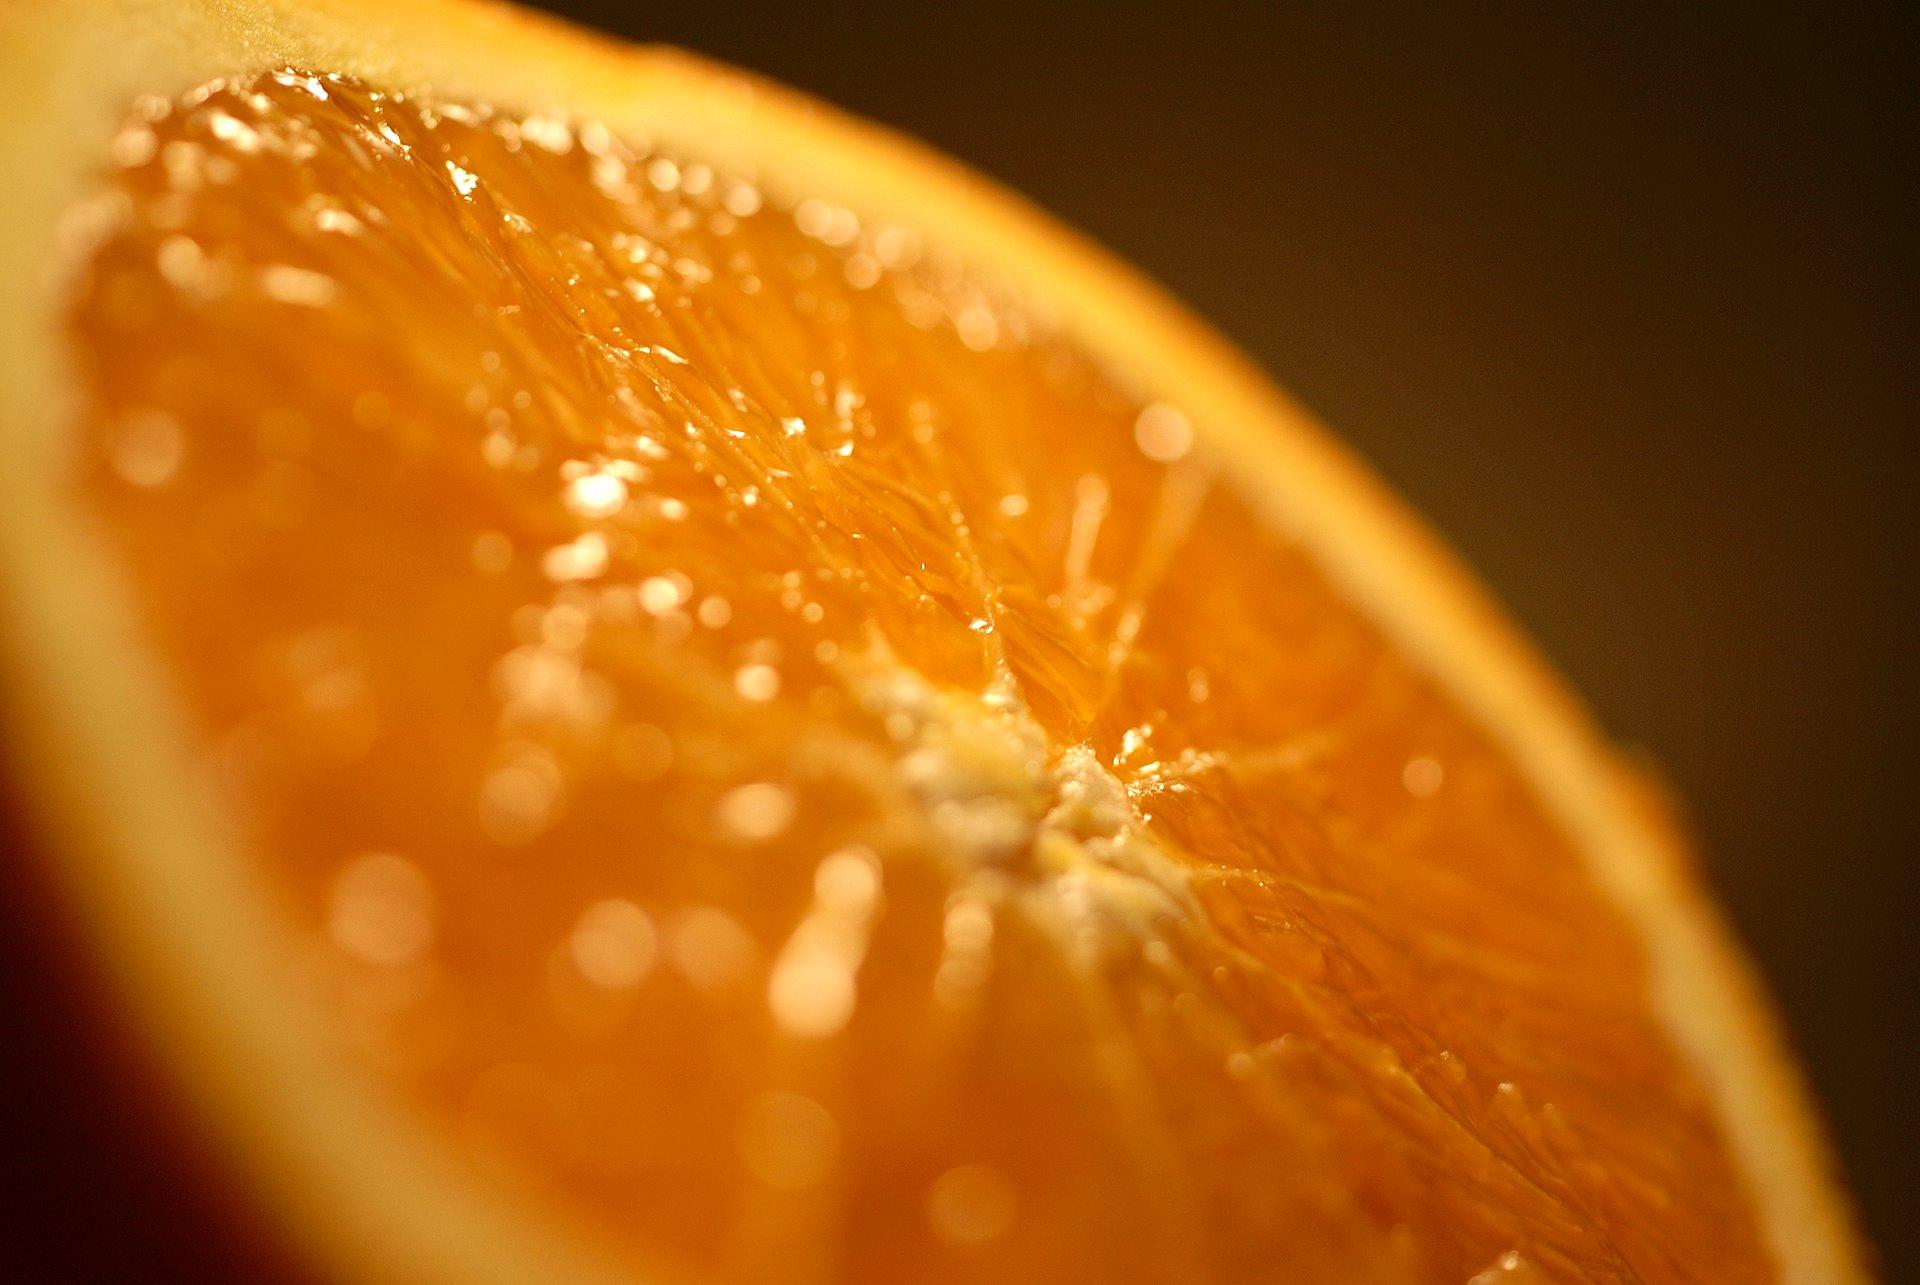 Orange Macro Wallpaper HD wallpapers   Orange Macro Wallpaper 1920x1285